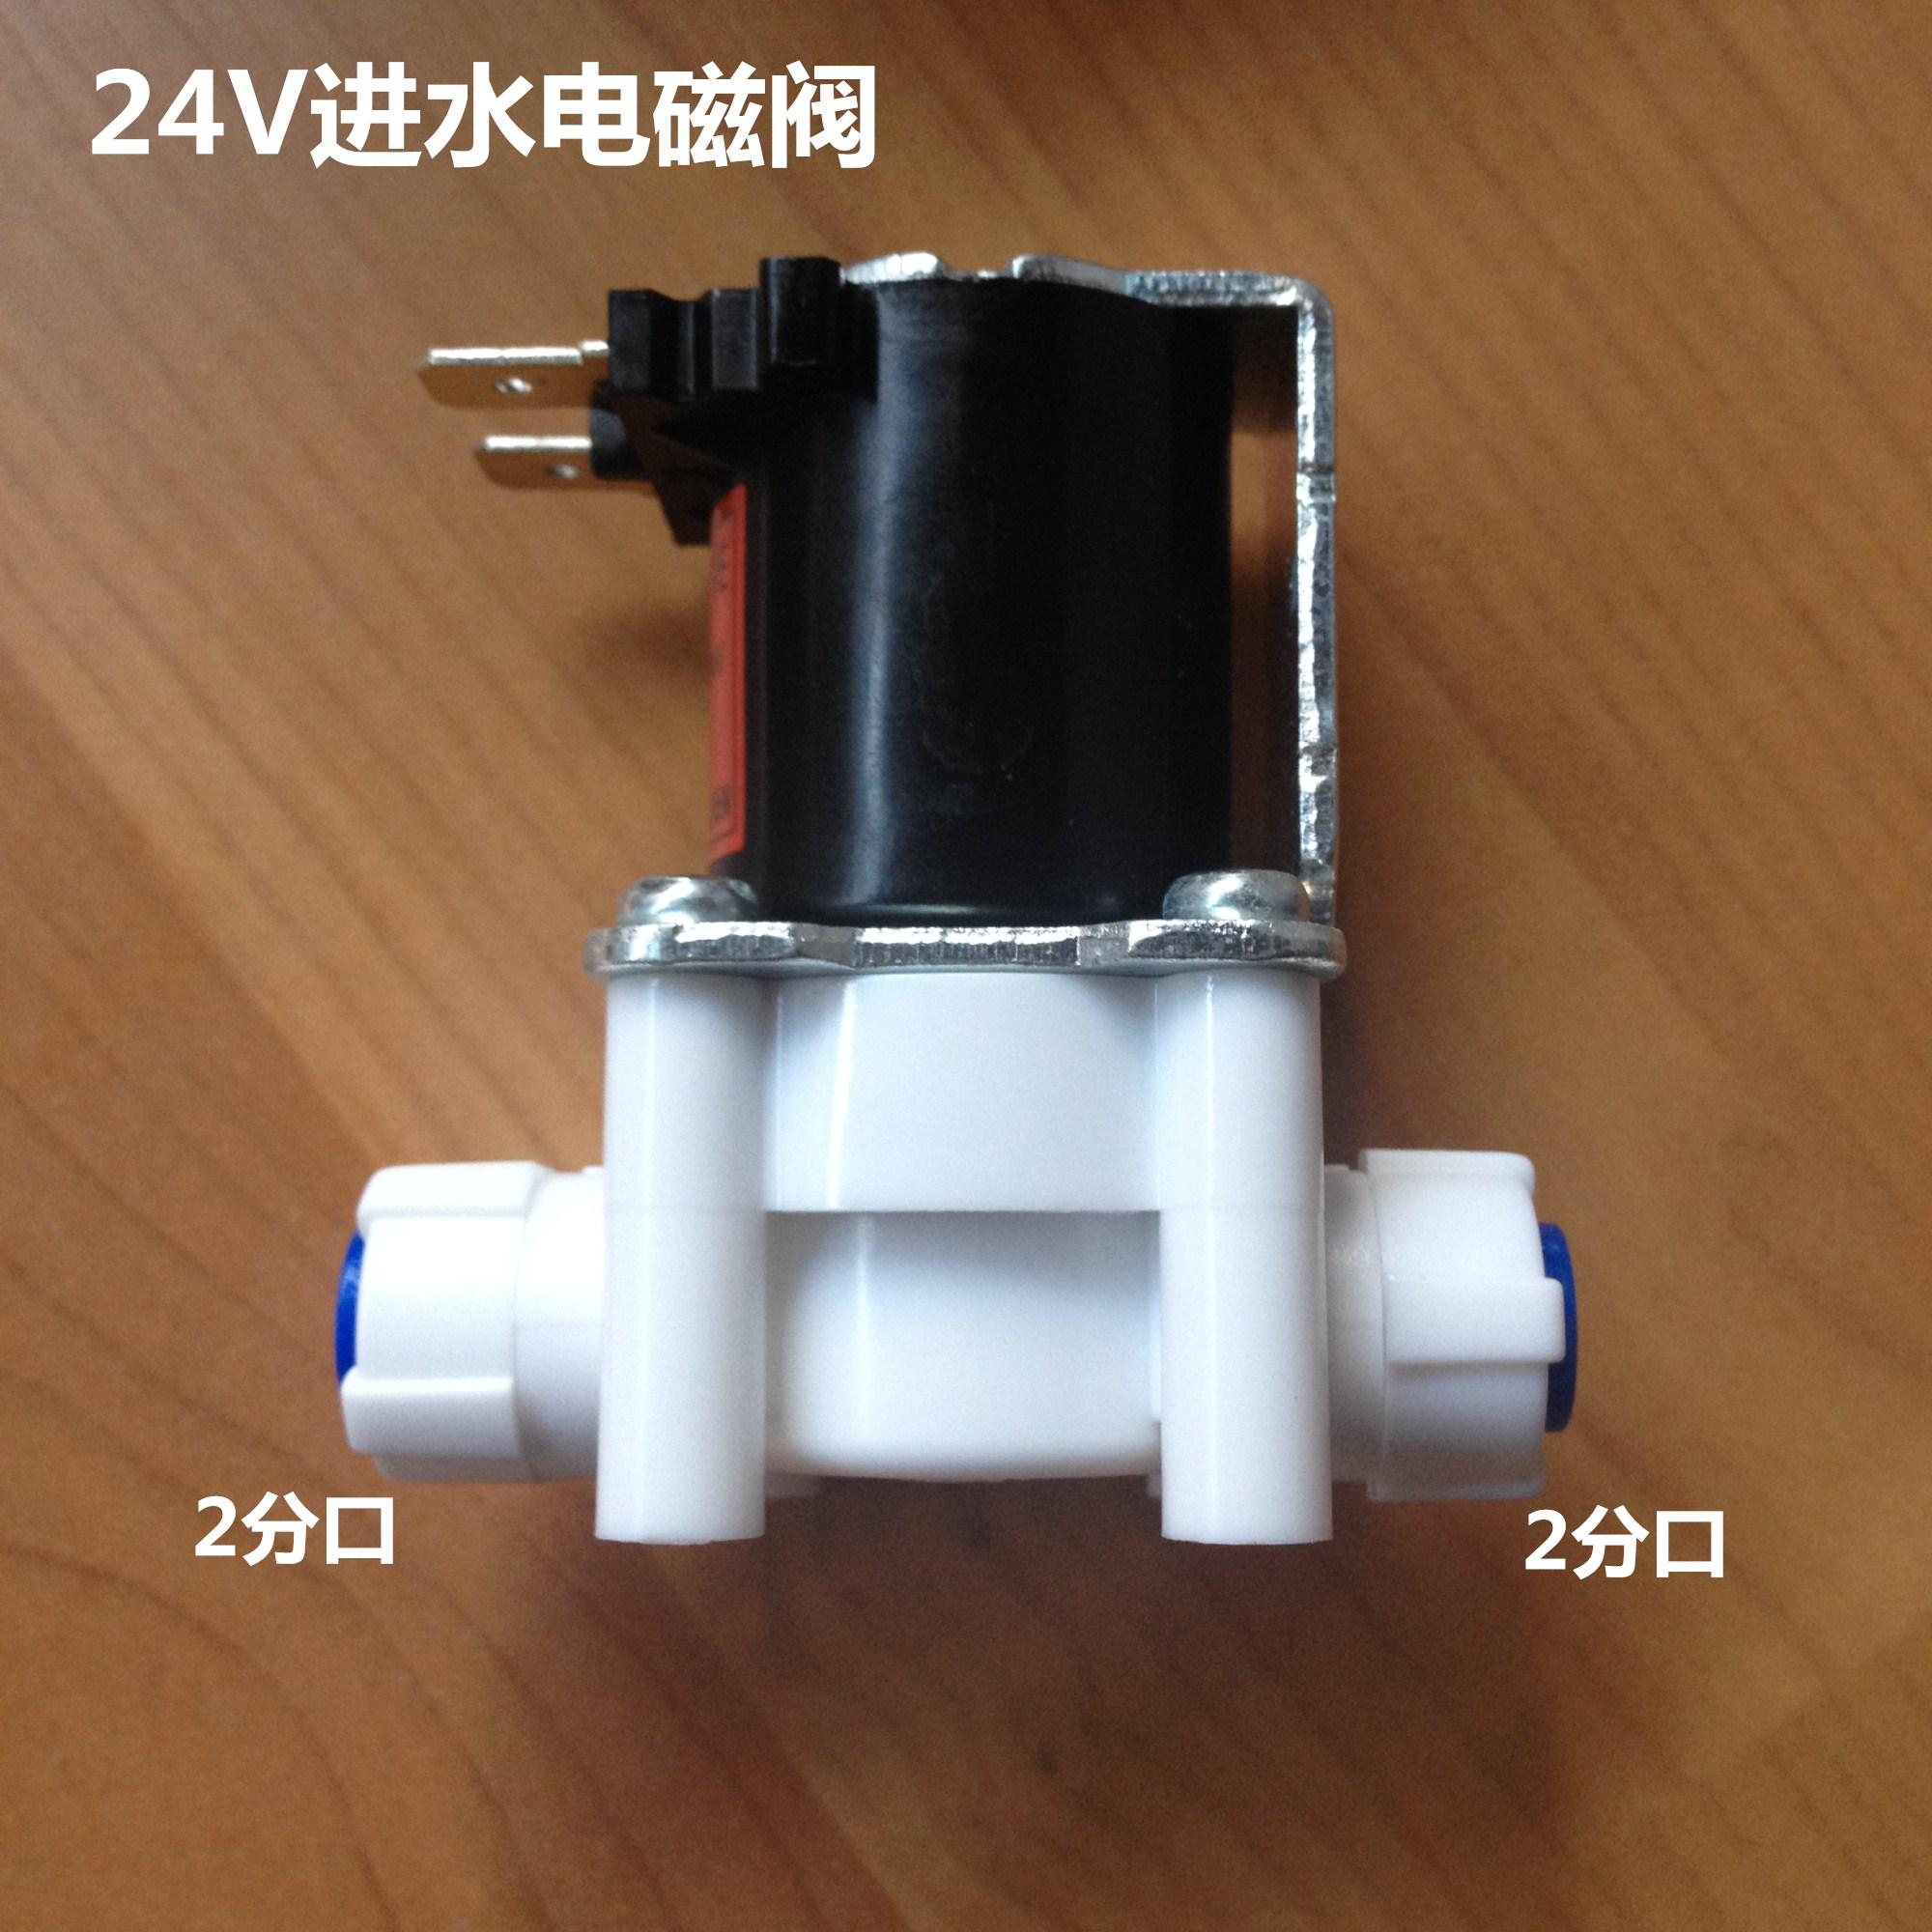 24v2分黑头进水电磁阀 净水器配件图片